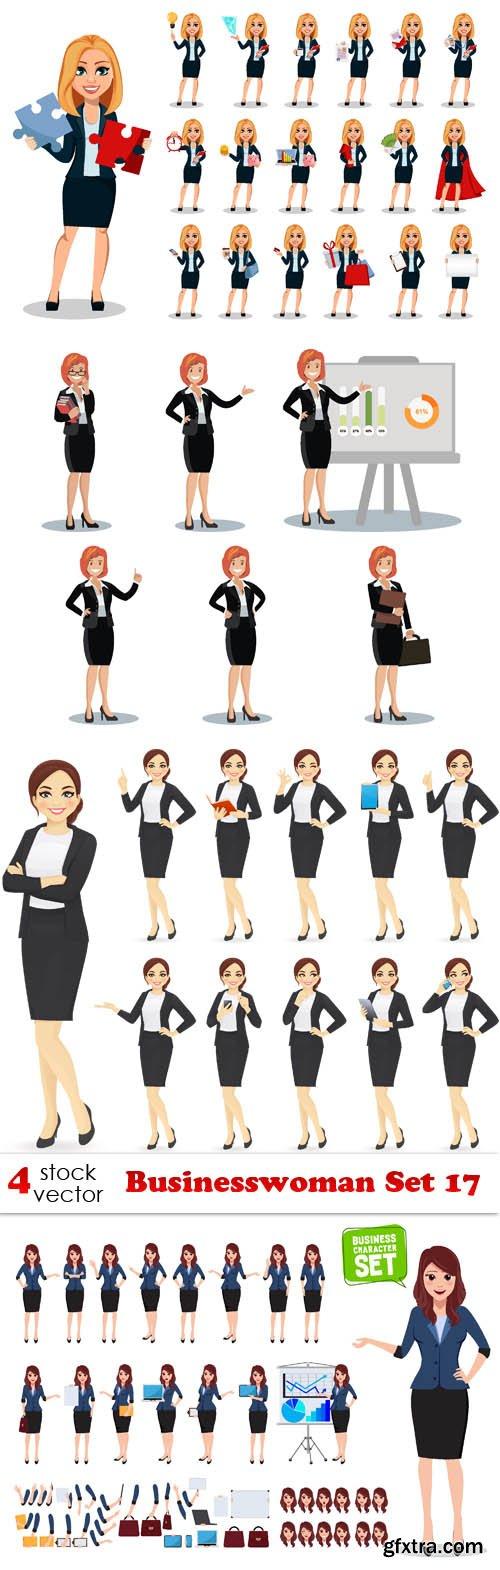 Vectors - Businesswoman Set 17